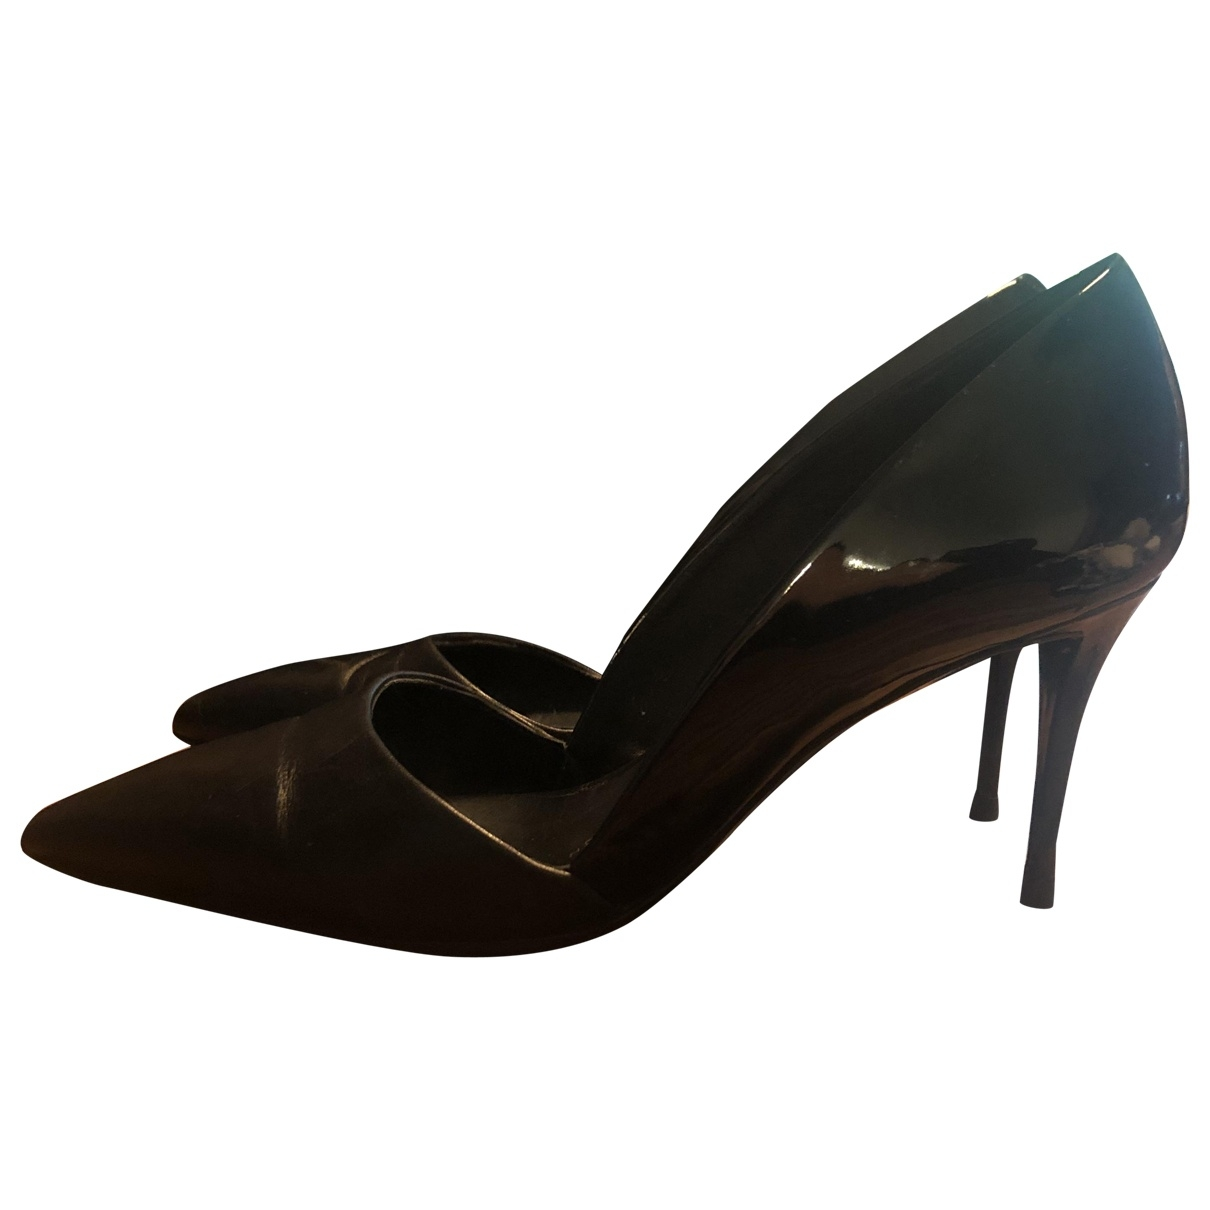 Giuseppe Zanotti \N Black Patent leather Heels for Women 37.5 EU